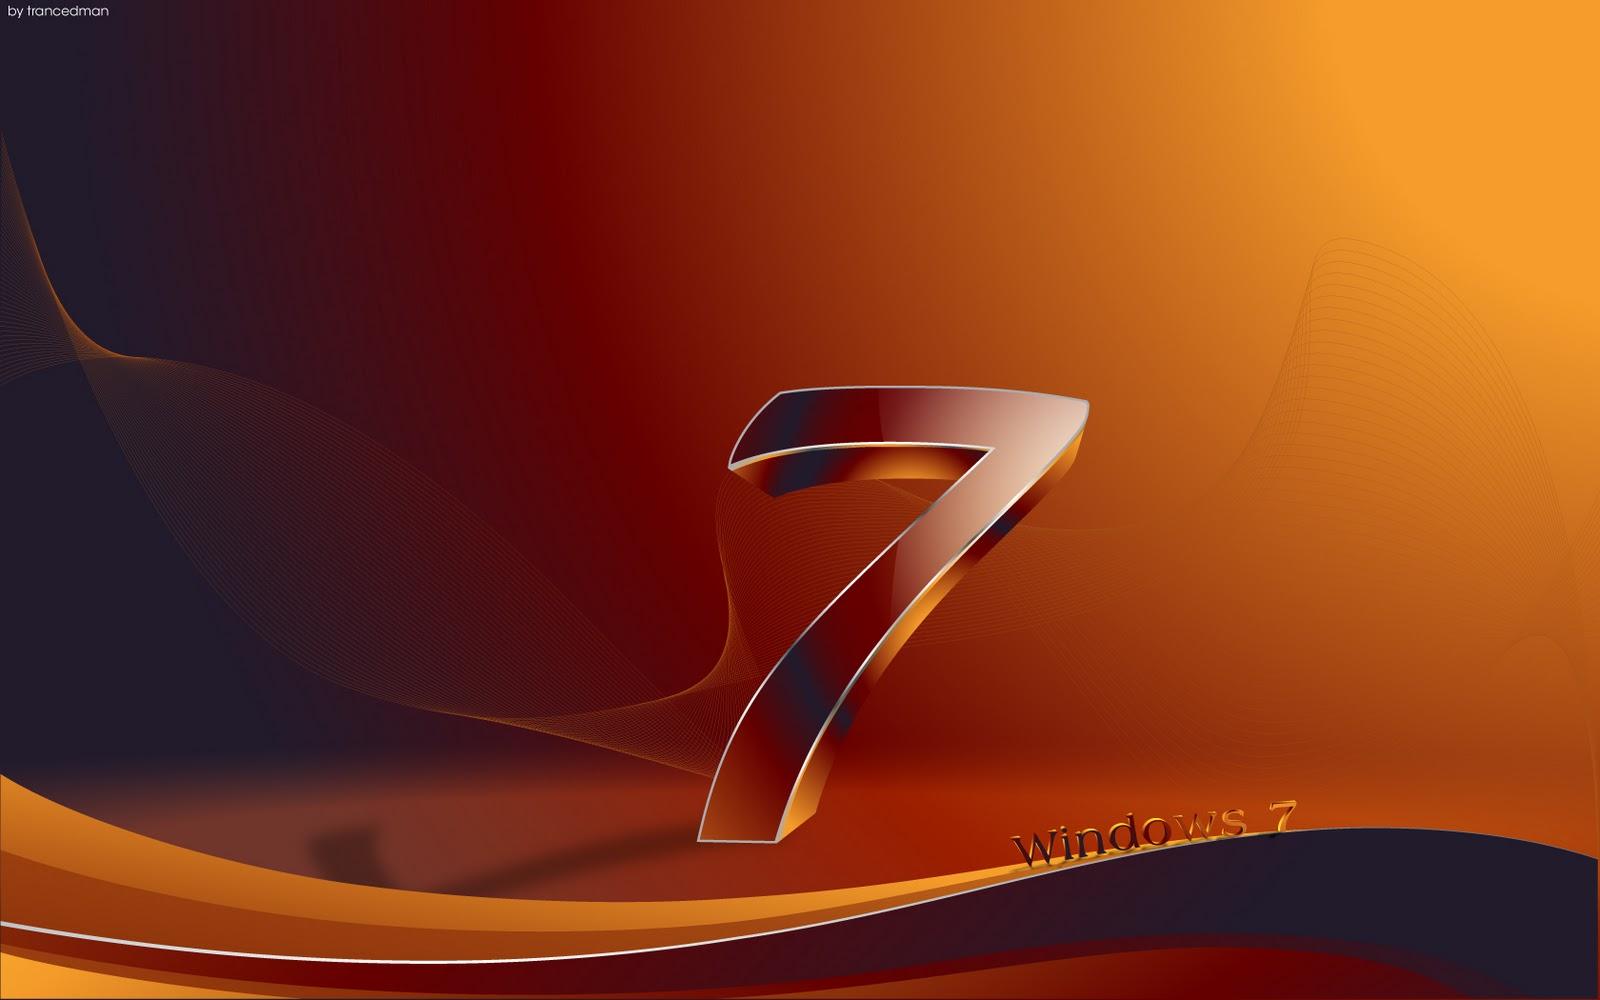 Free Wallpaper Download: Top 10 Microsoft Windows 7 ...